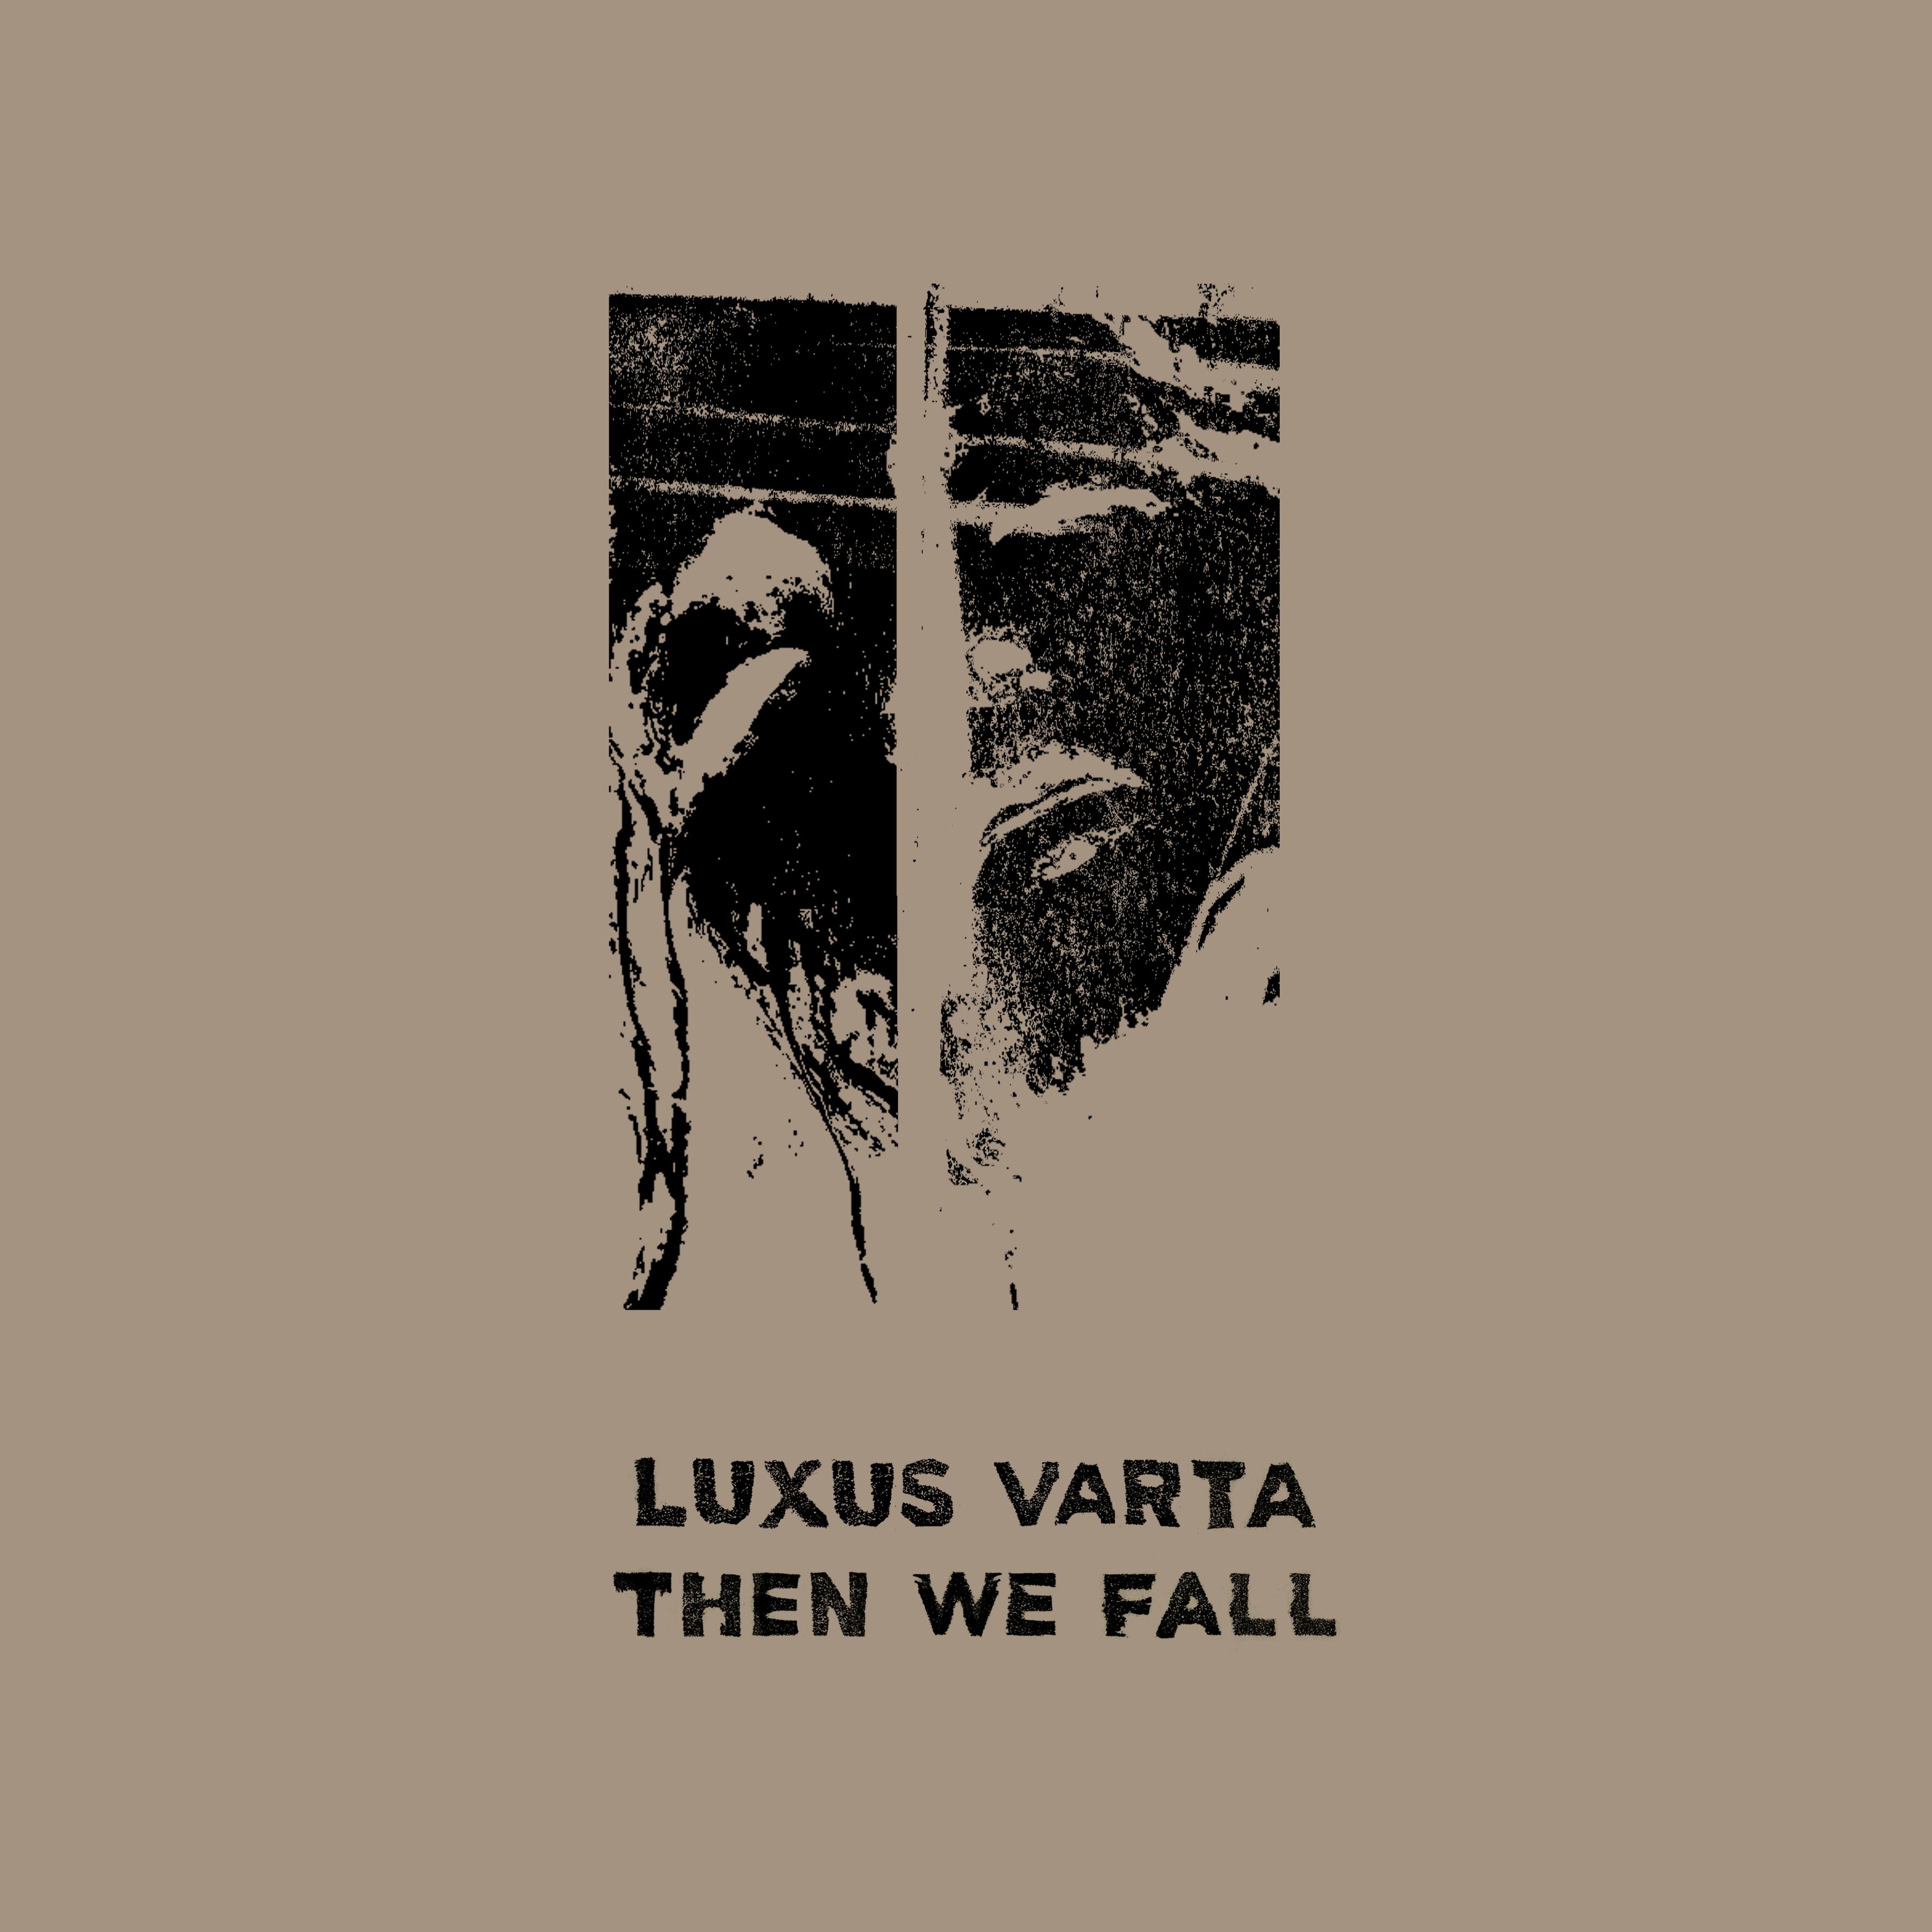 luxusvarta_bt22_artwork.jpg